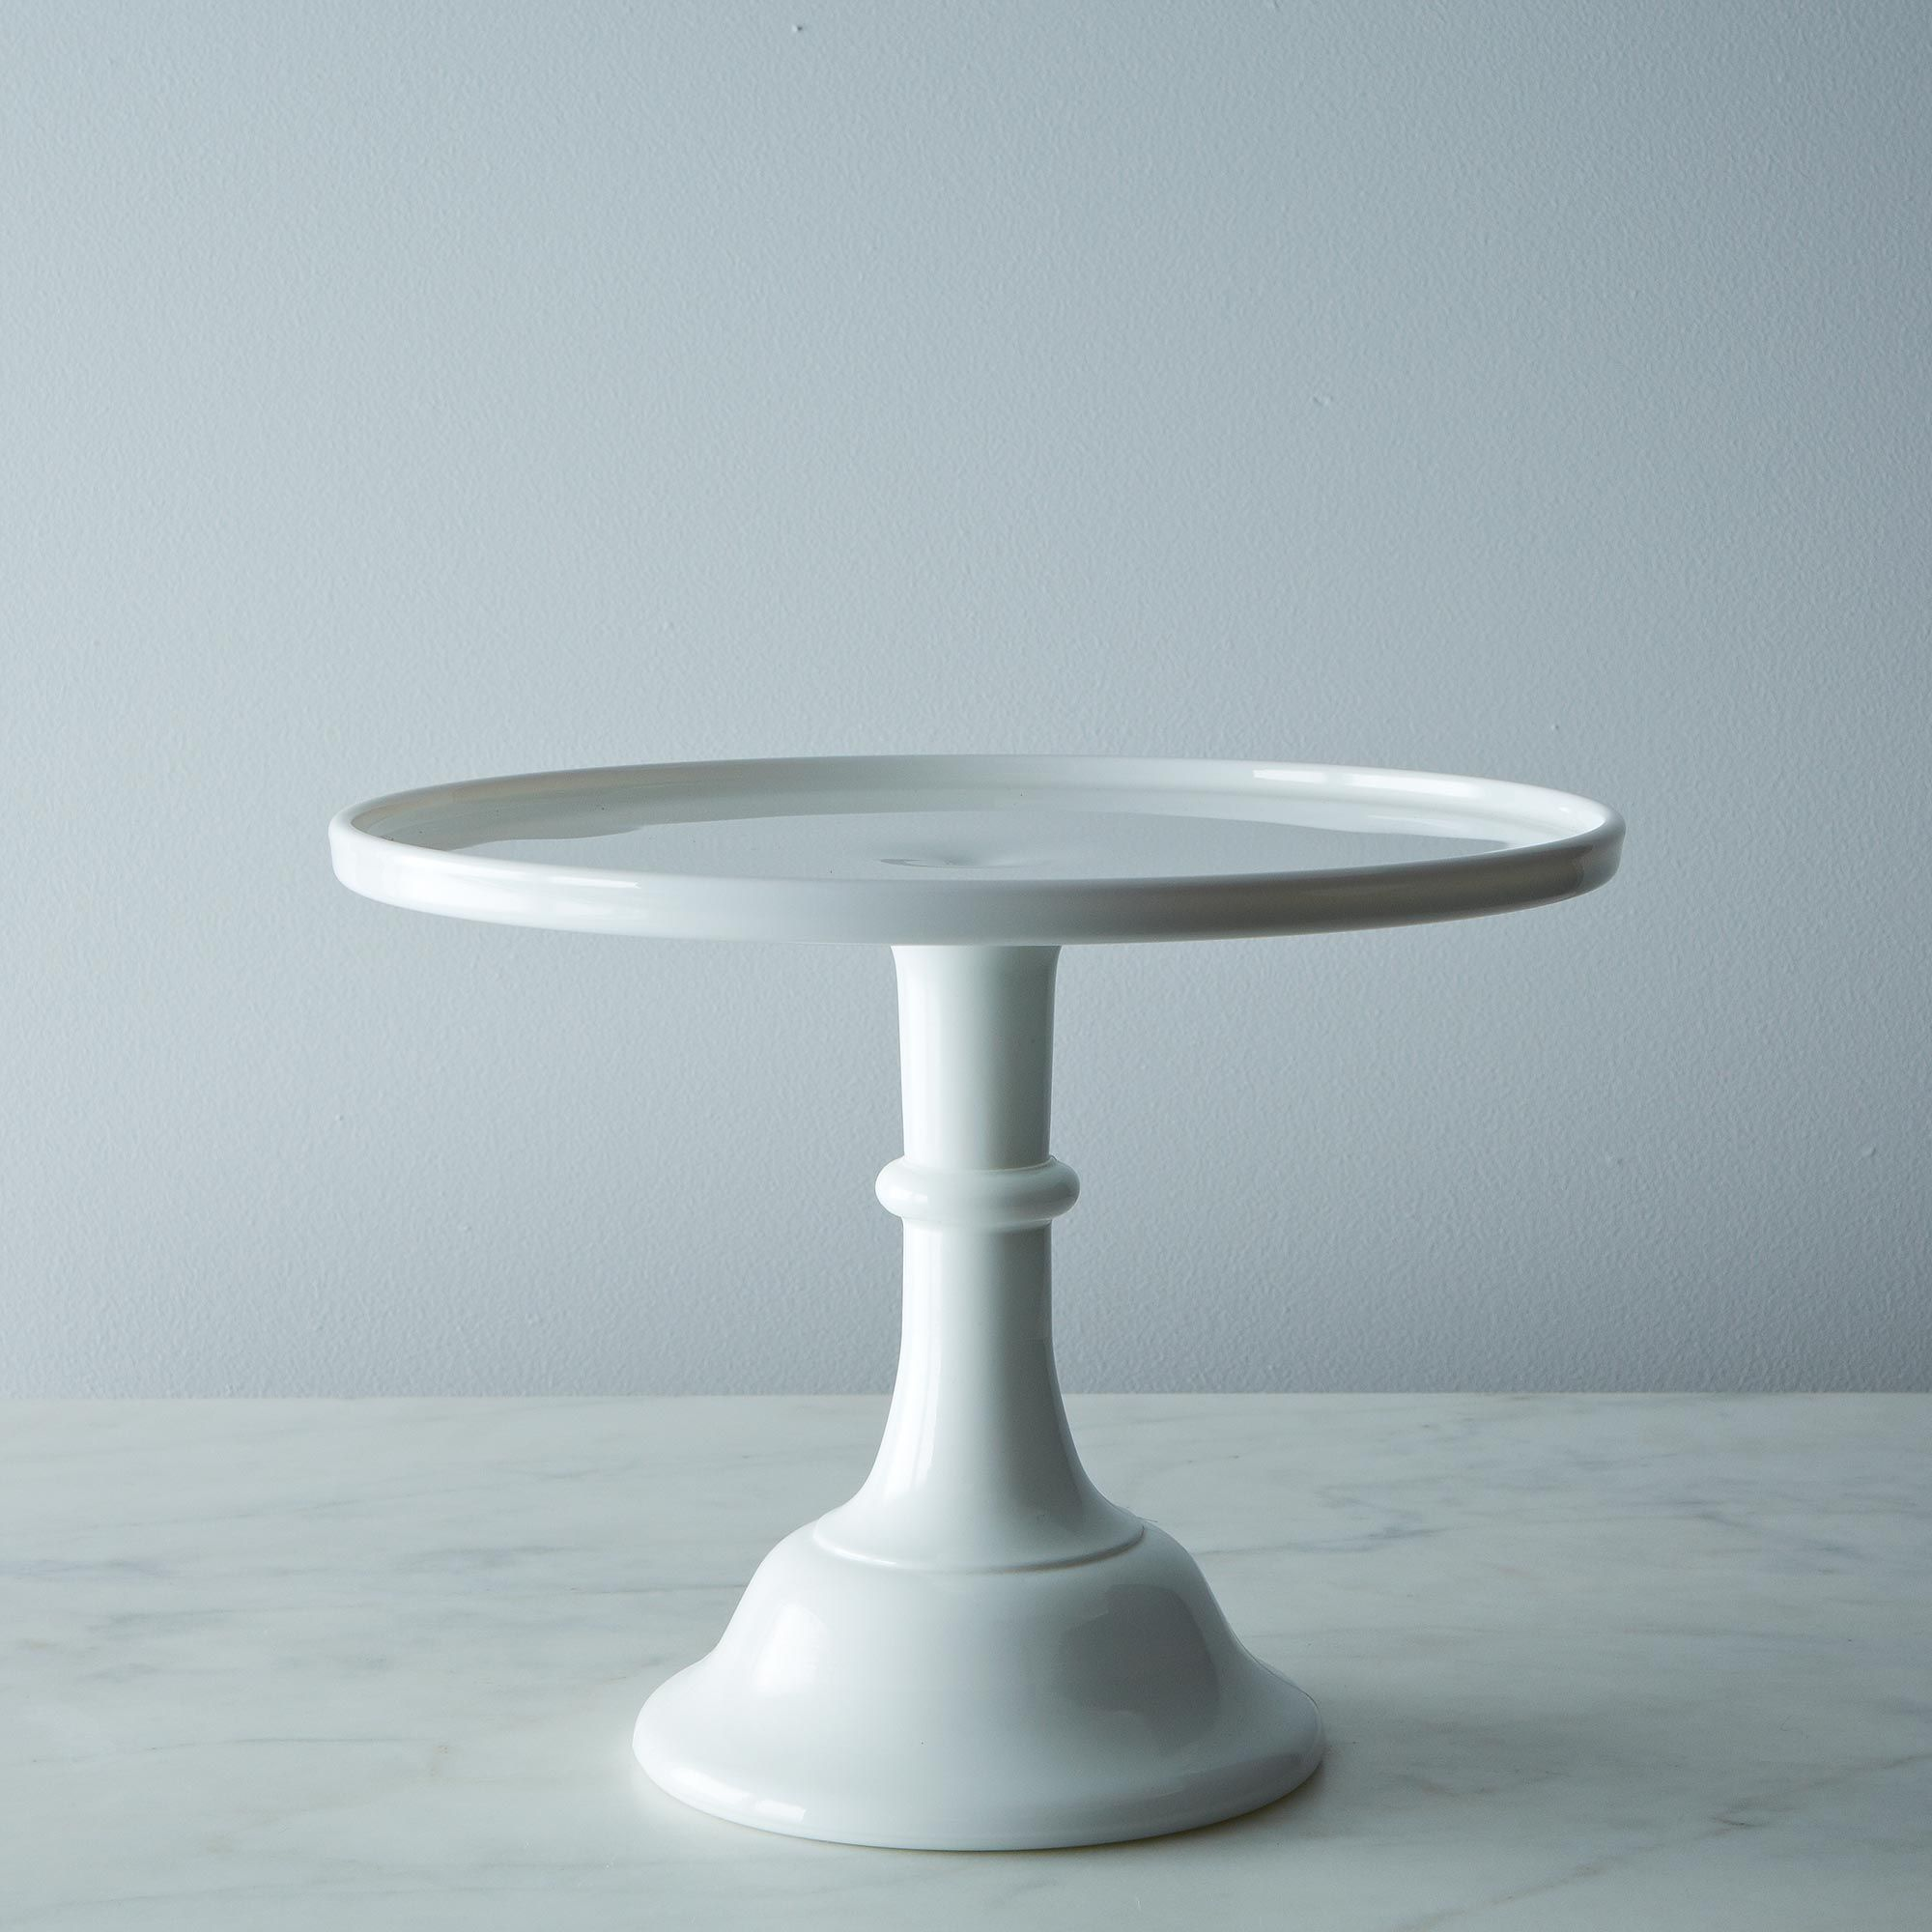 85b5950f 7044 4b4c b870 9c723f892c95  2013 1030 mosser white glass cake plate 012